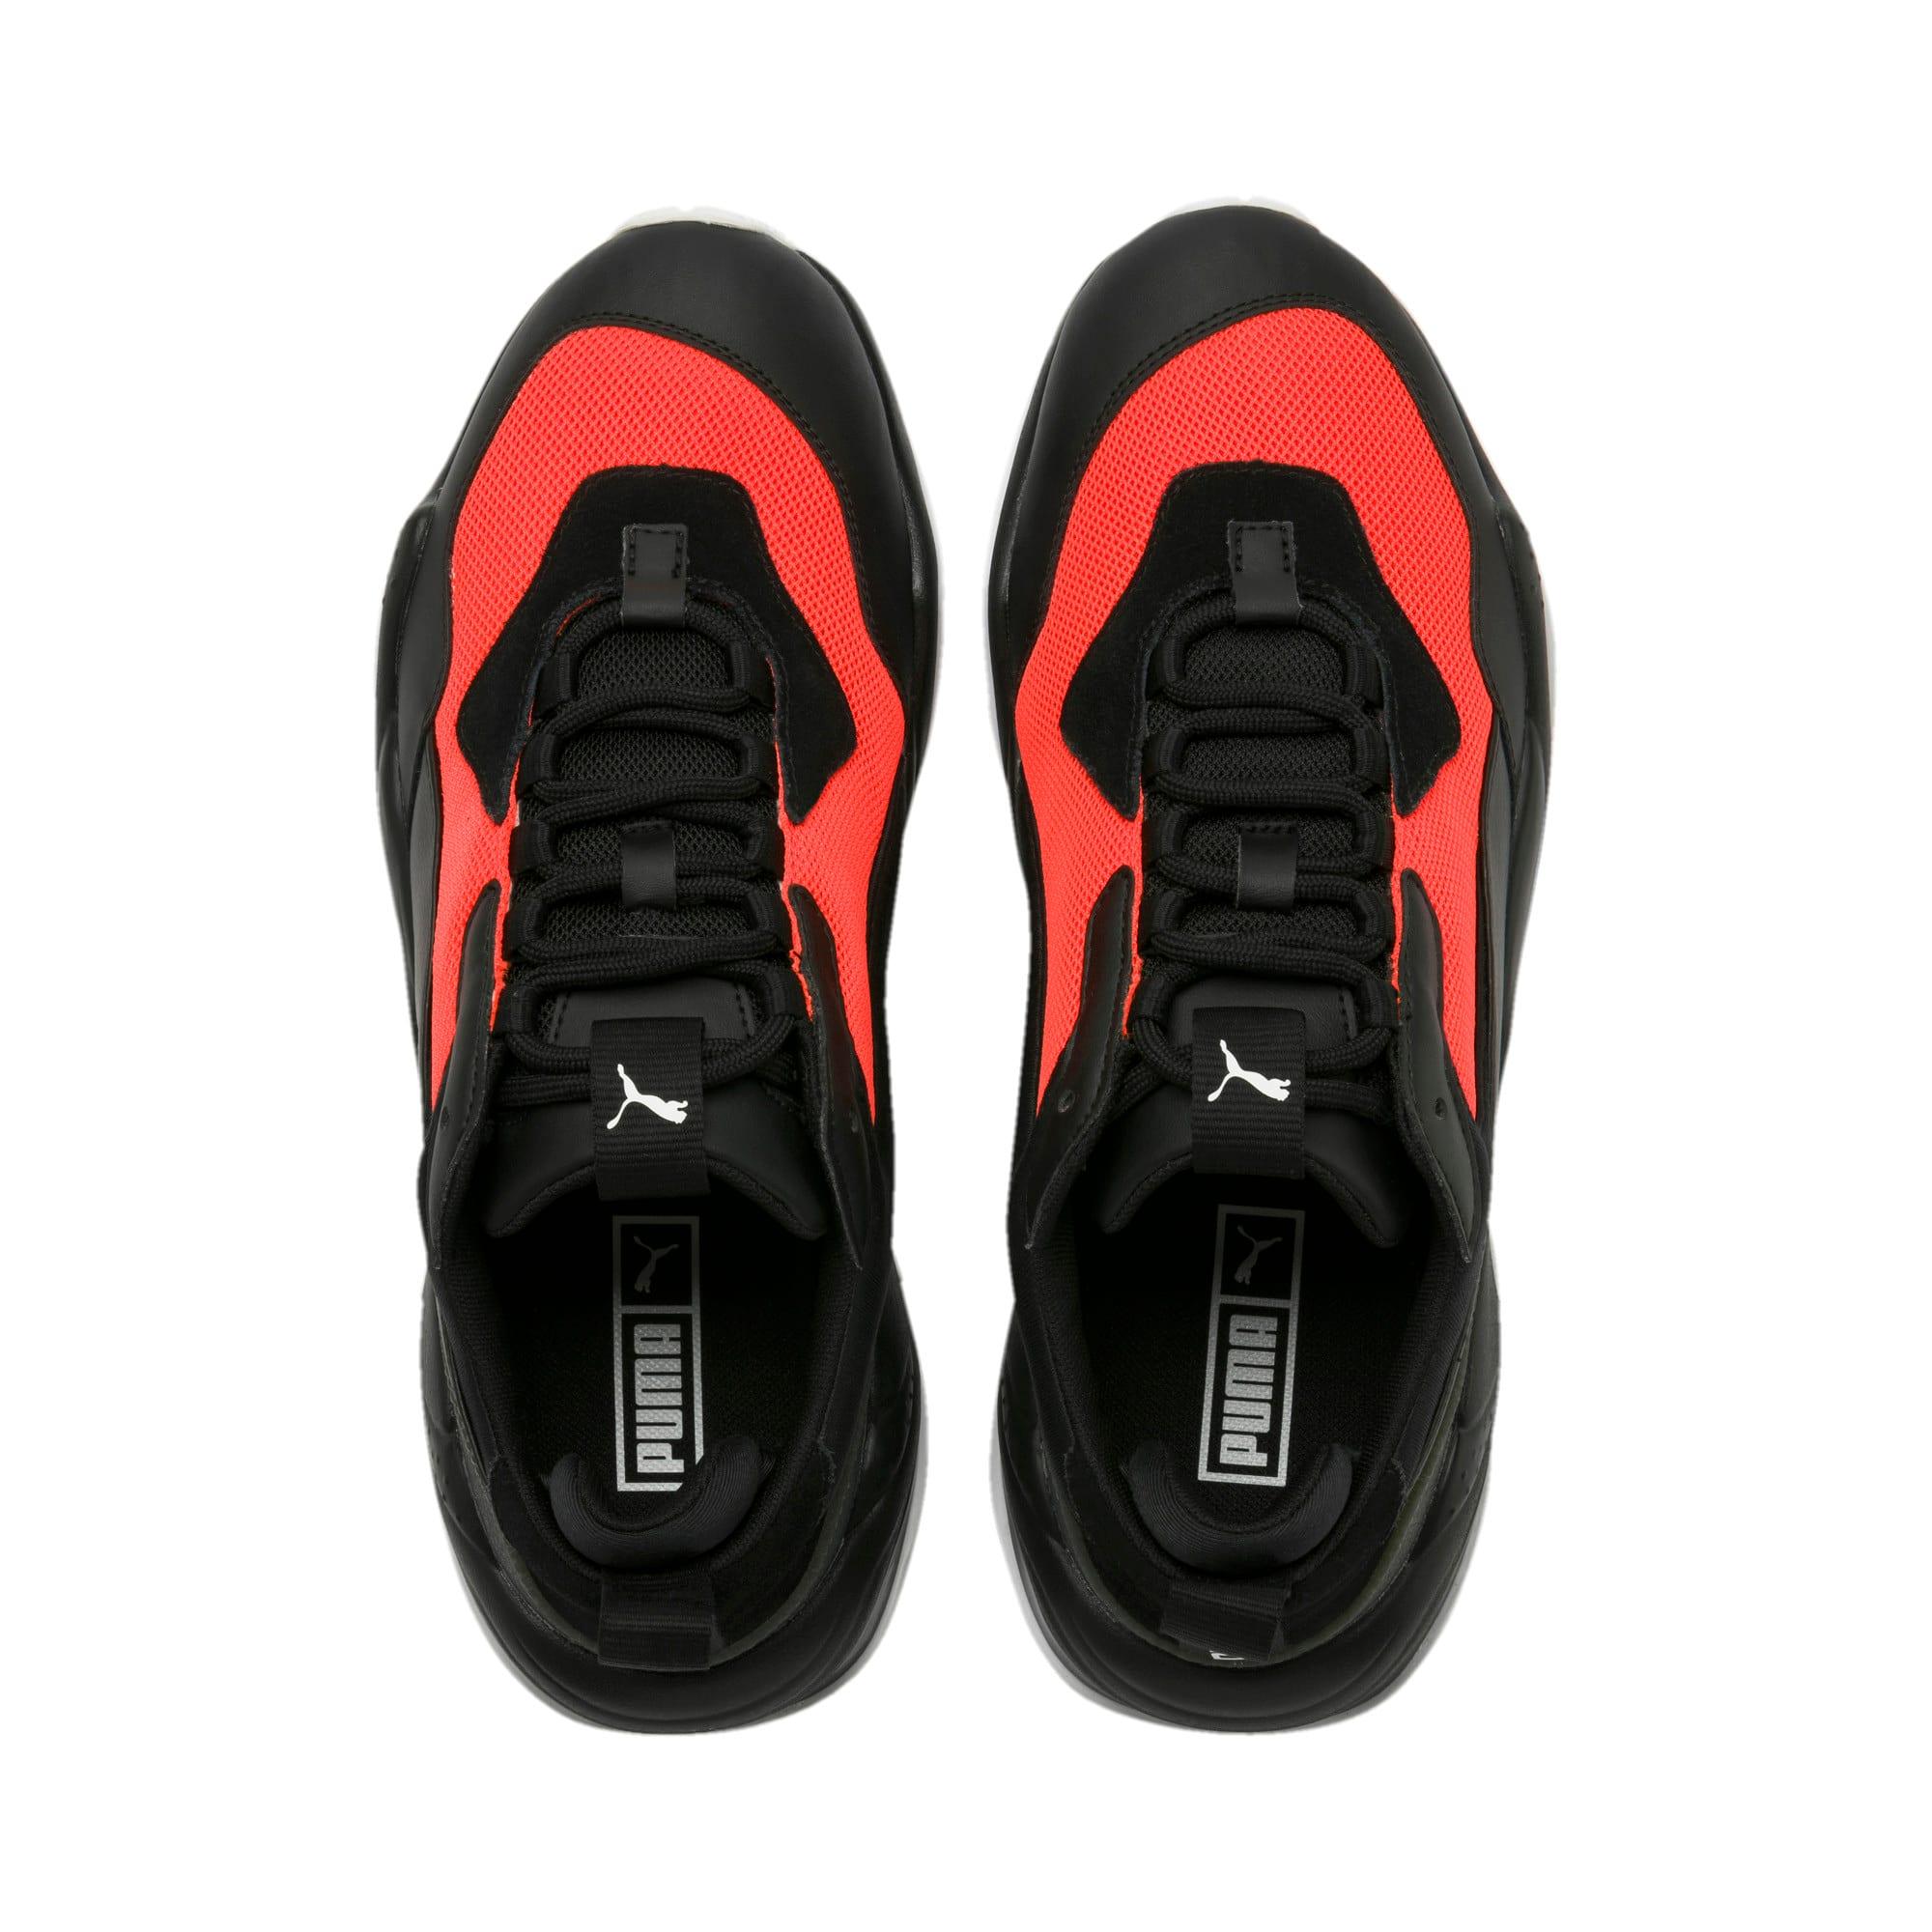 Thumbnail 7 of Thunder Fashion 2.0 sportschoenen, Puma Black-Nrgy Red, medium